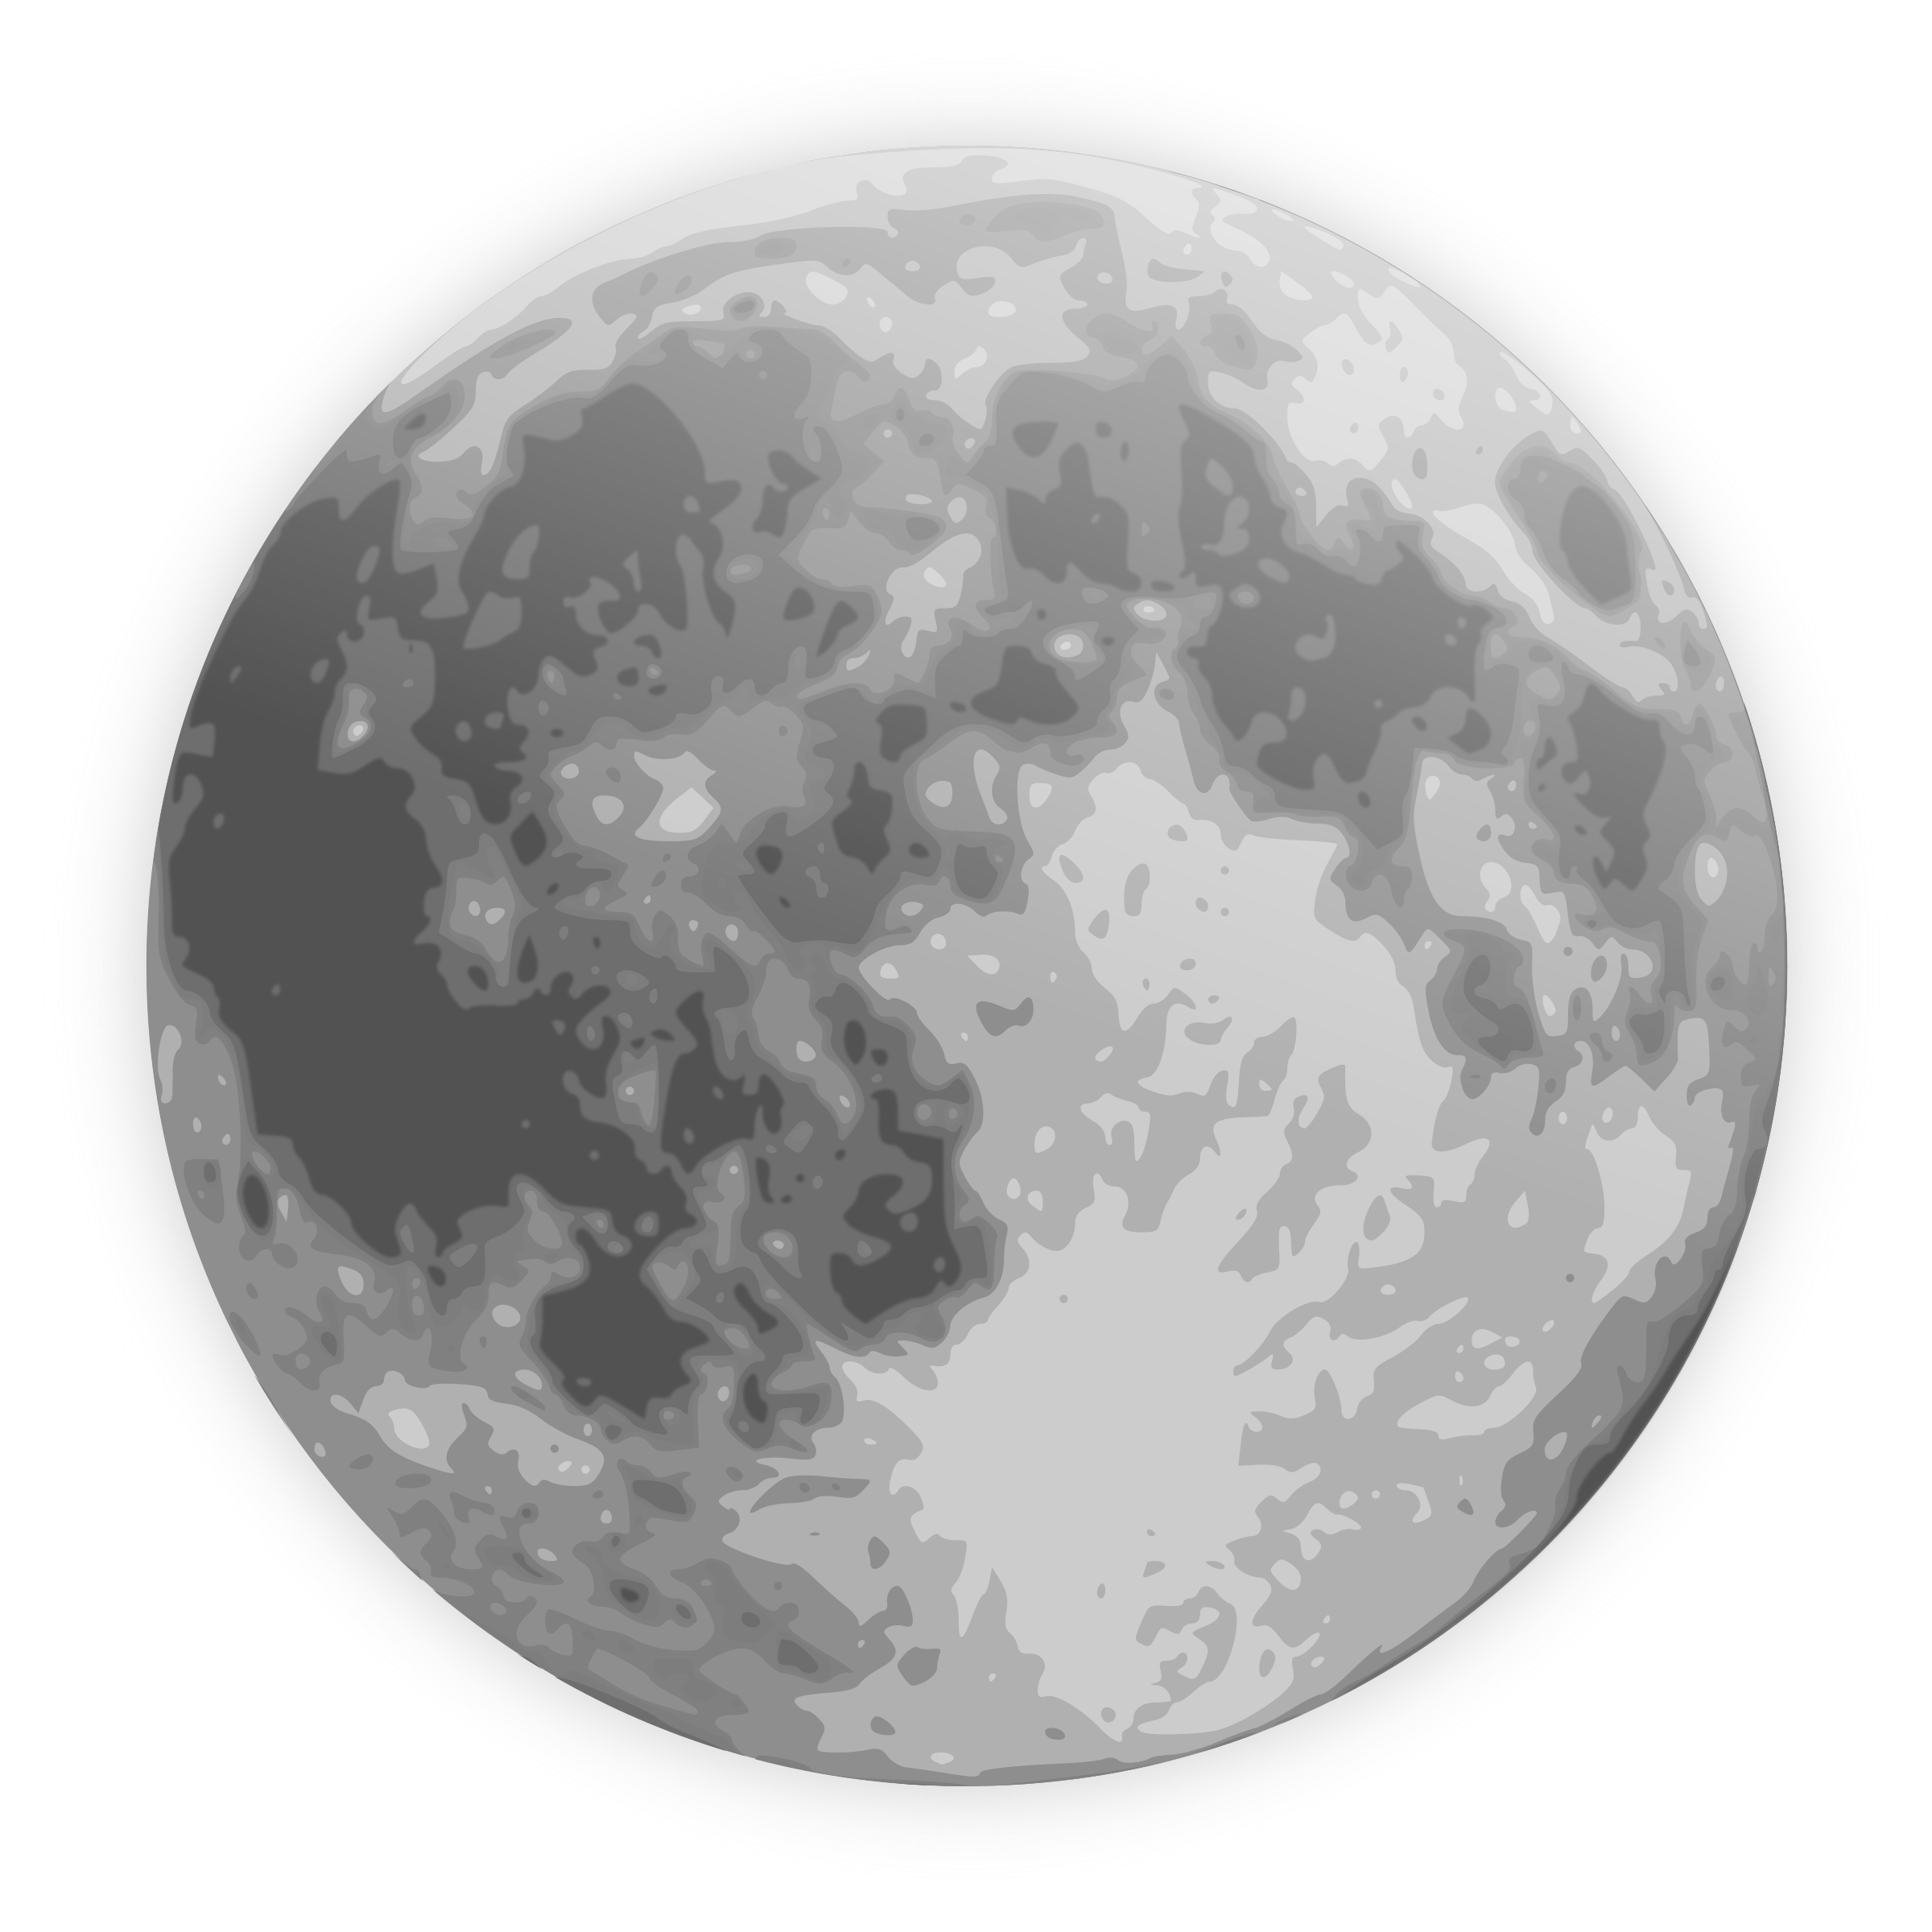 Free Full Moon Clip Art. BIG IMAGE (PNG)